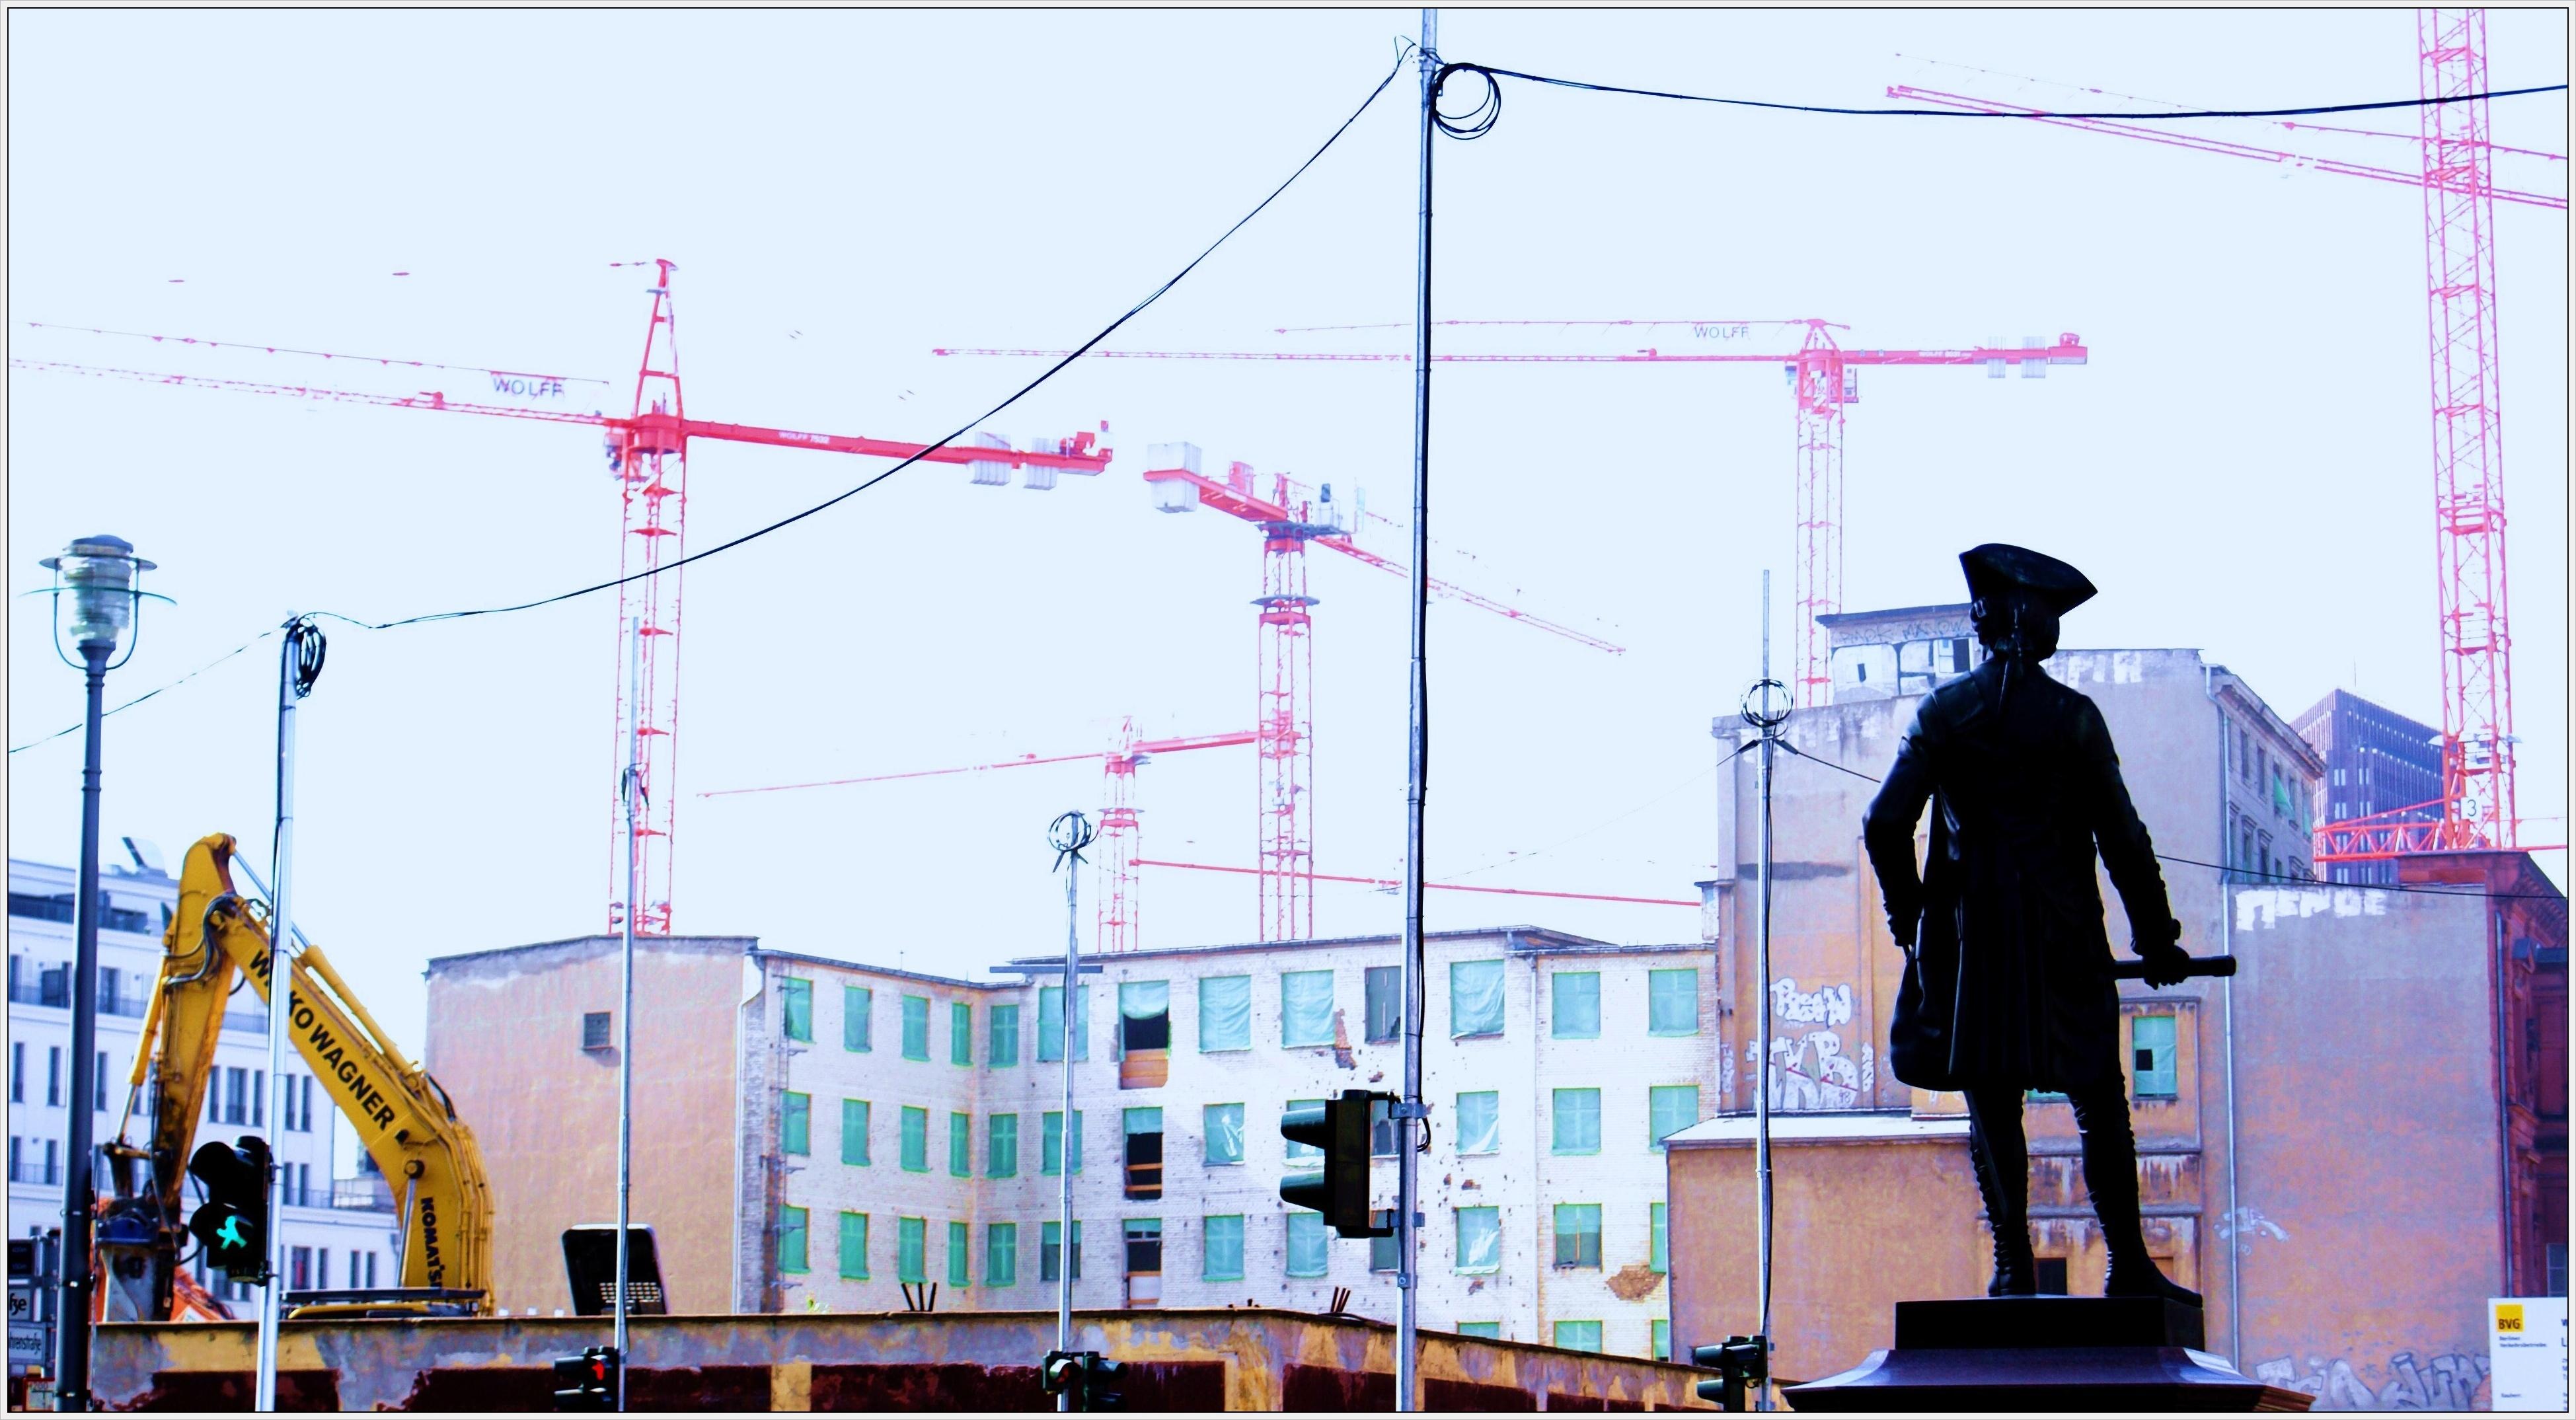 Baustellenwache